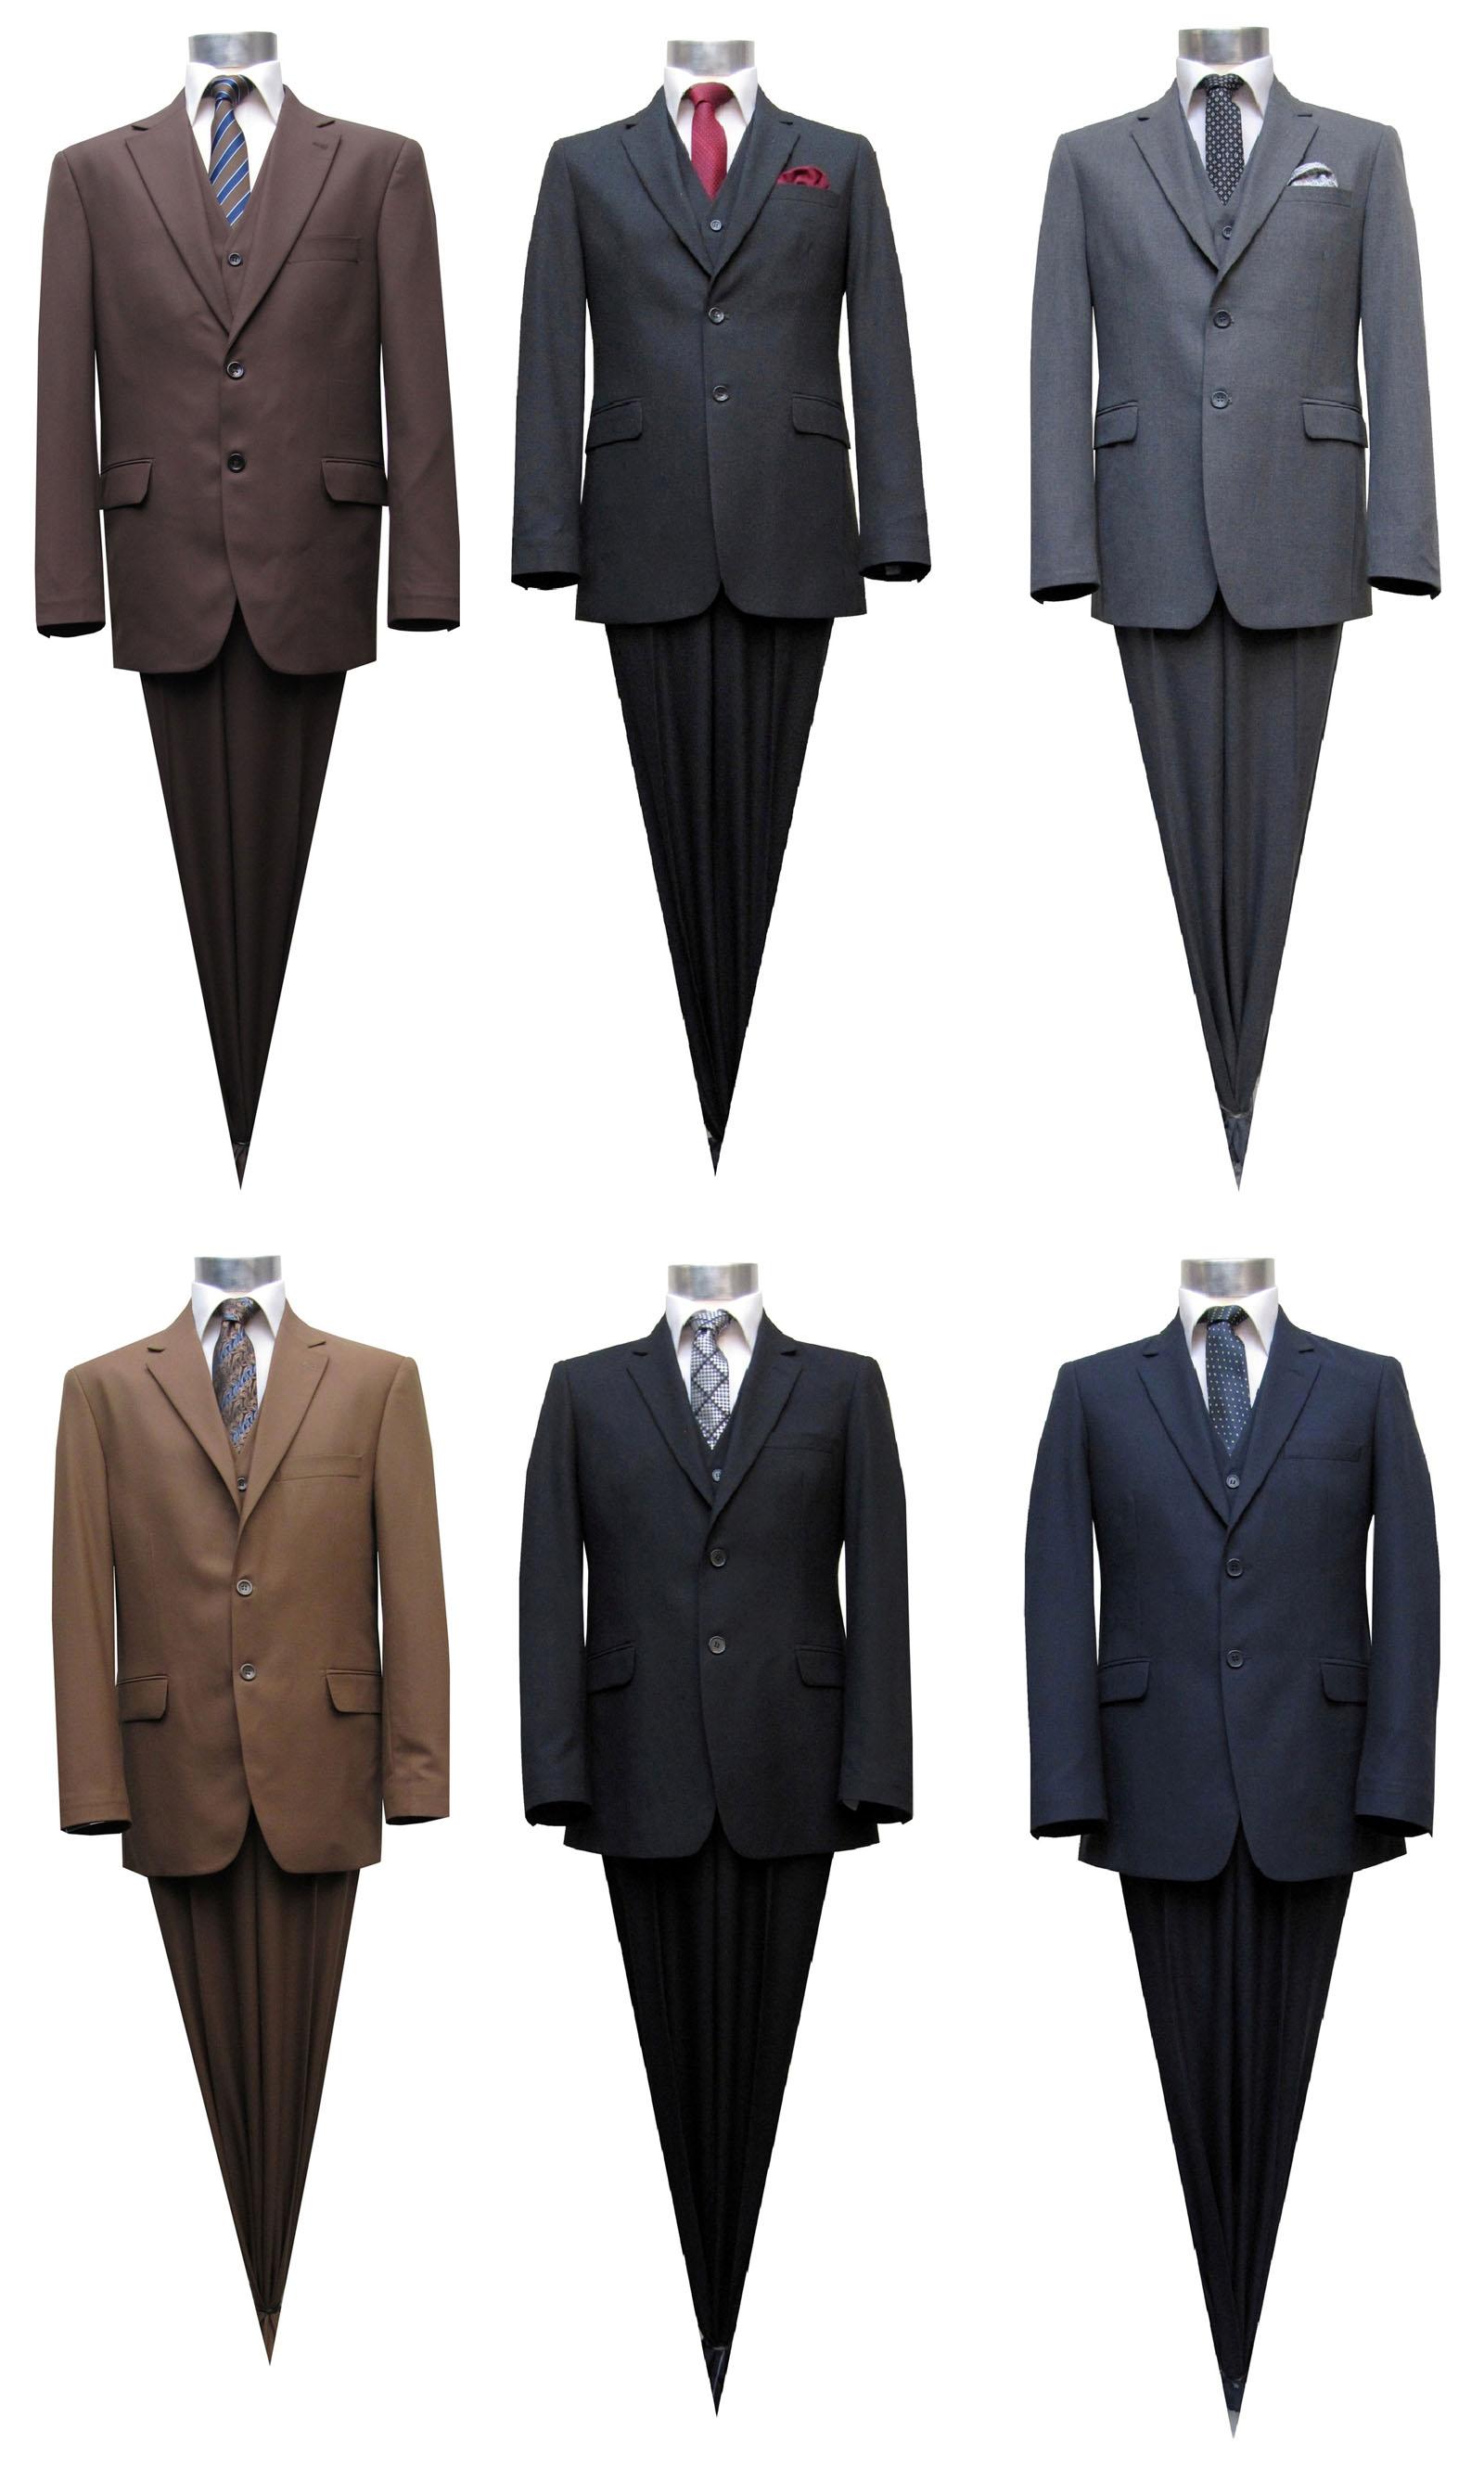 Muga Homme Costume 120s clasic en plusieurs tailles 44-72 9f09826a6c4